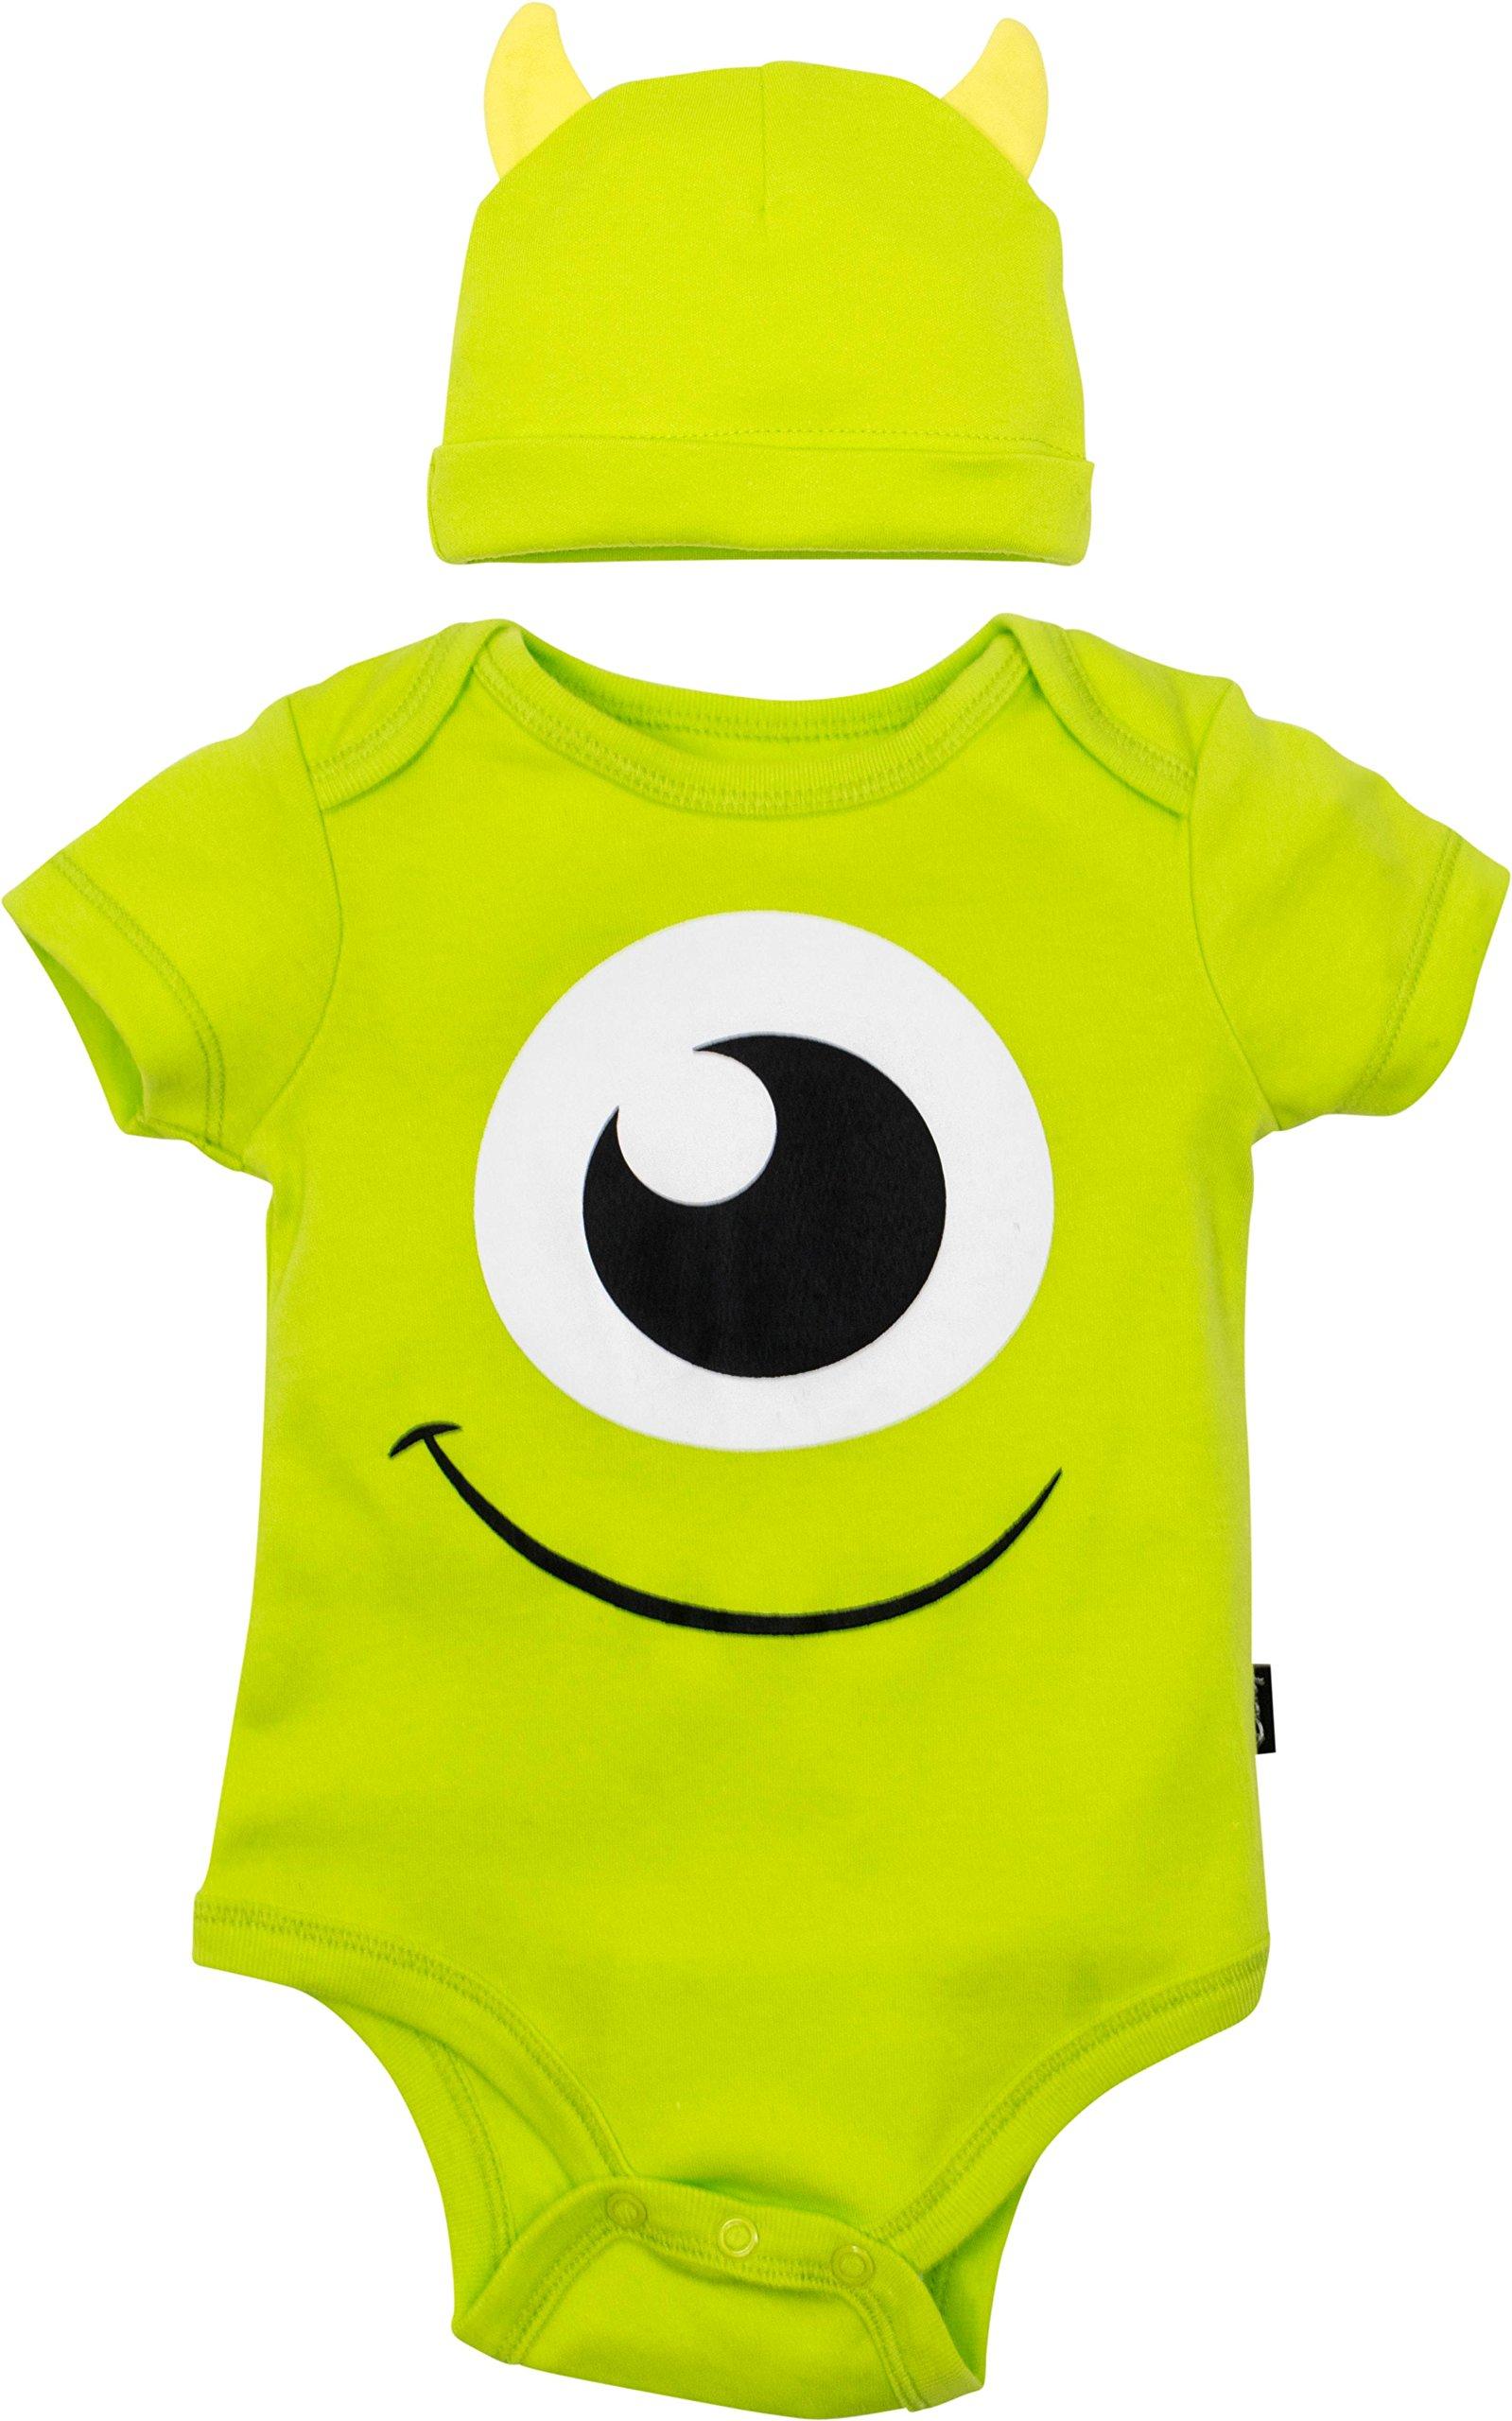 Disney Pixar Monsters Inc. Mike Wazowski Baby Boys' Costume Bodysuit & Hat Green (0-3 Months)